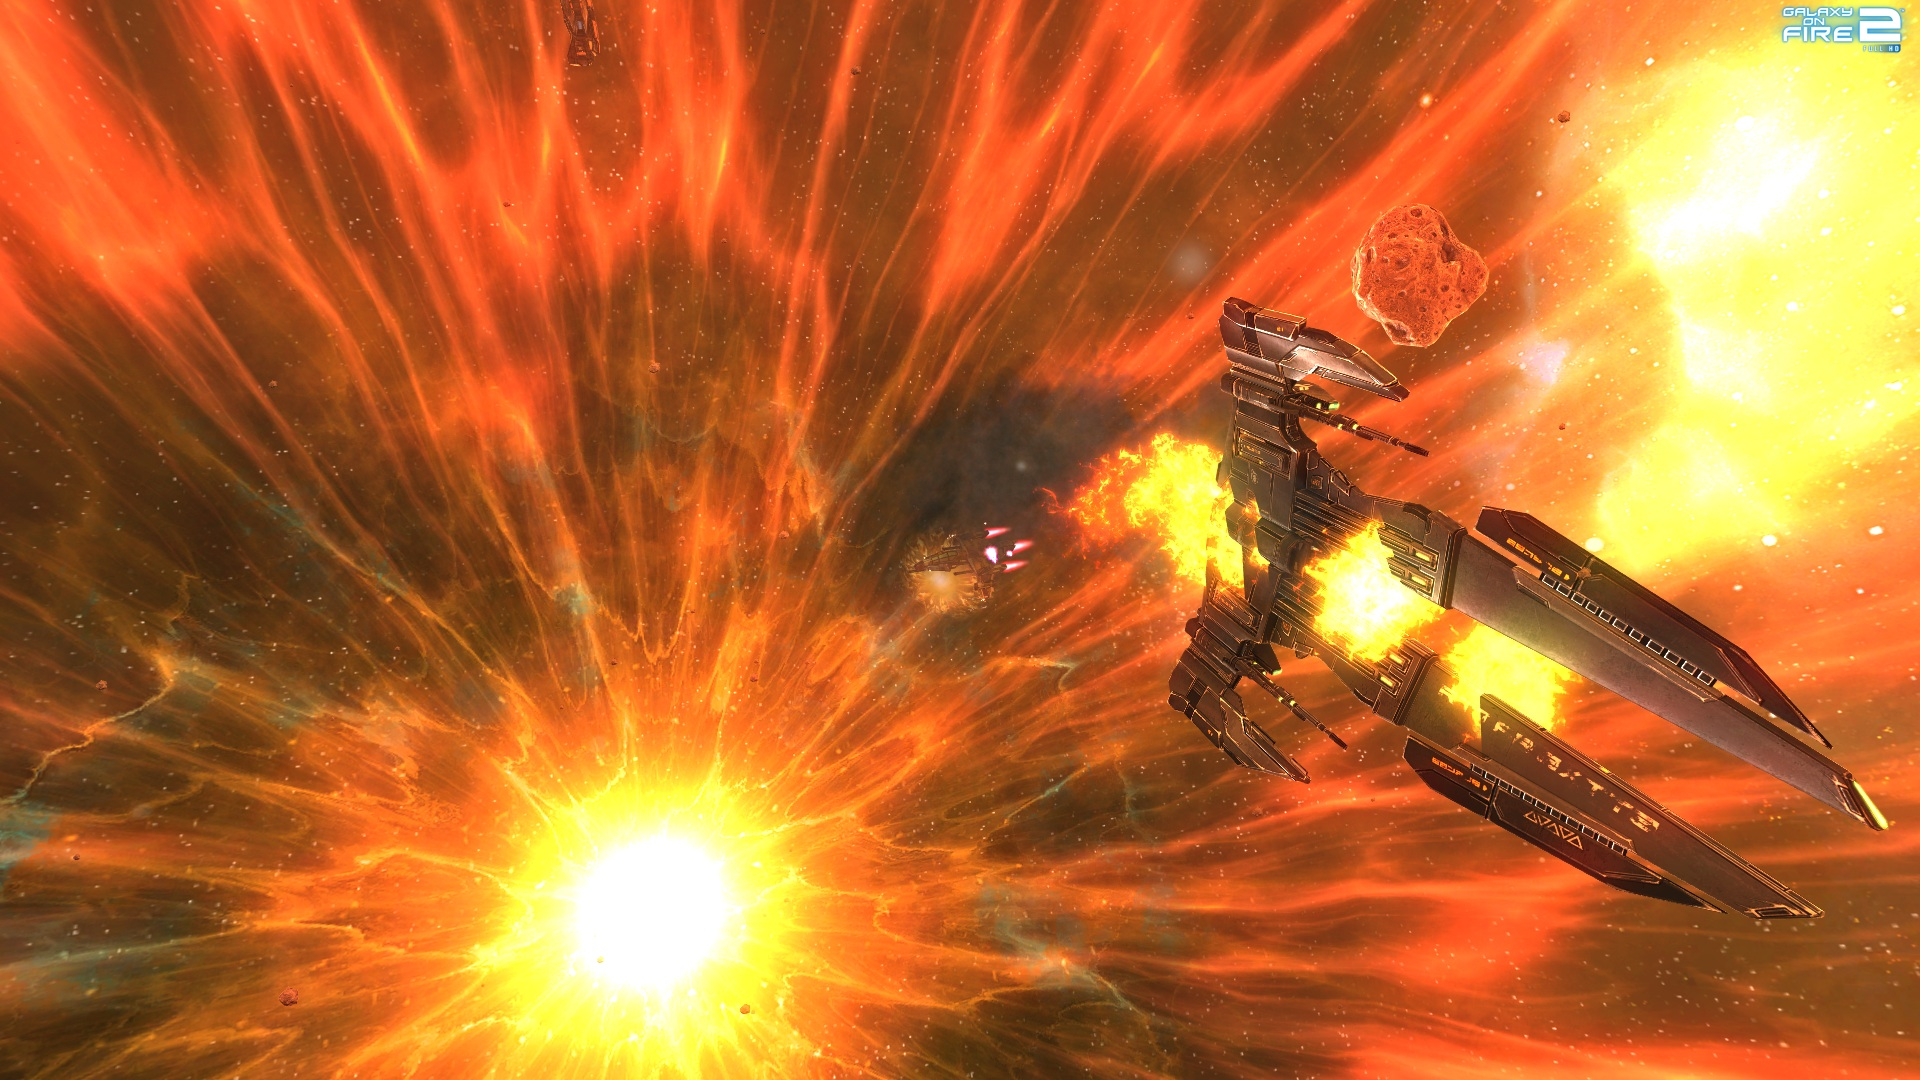 Galaxy on Fire 2 Full HD: Supernova